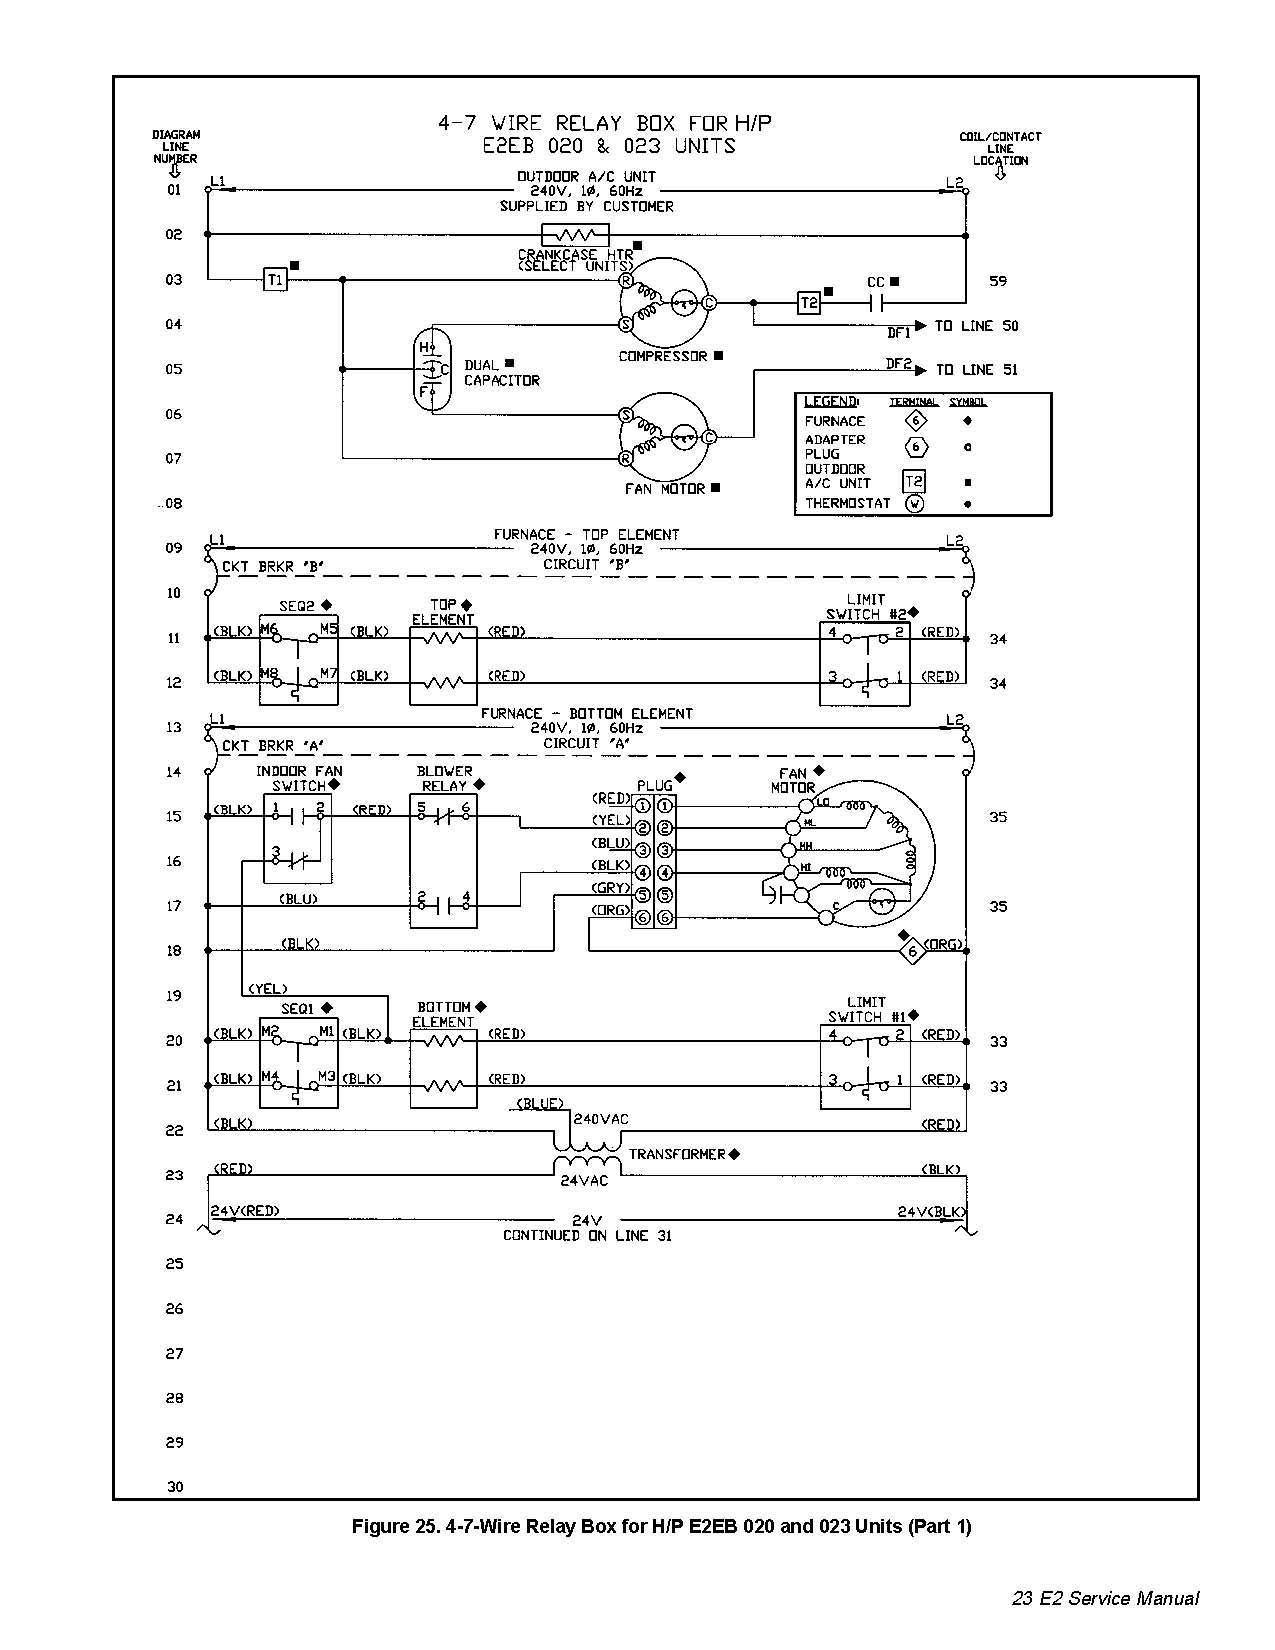 Intertherm Sequencer Wiring Diagram   Manual E-Books - Electric Furnace Wiring Diagram Sequencer